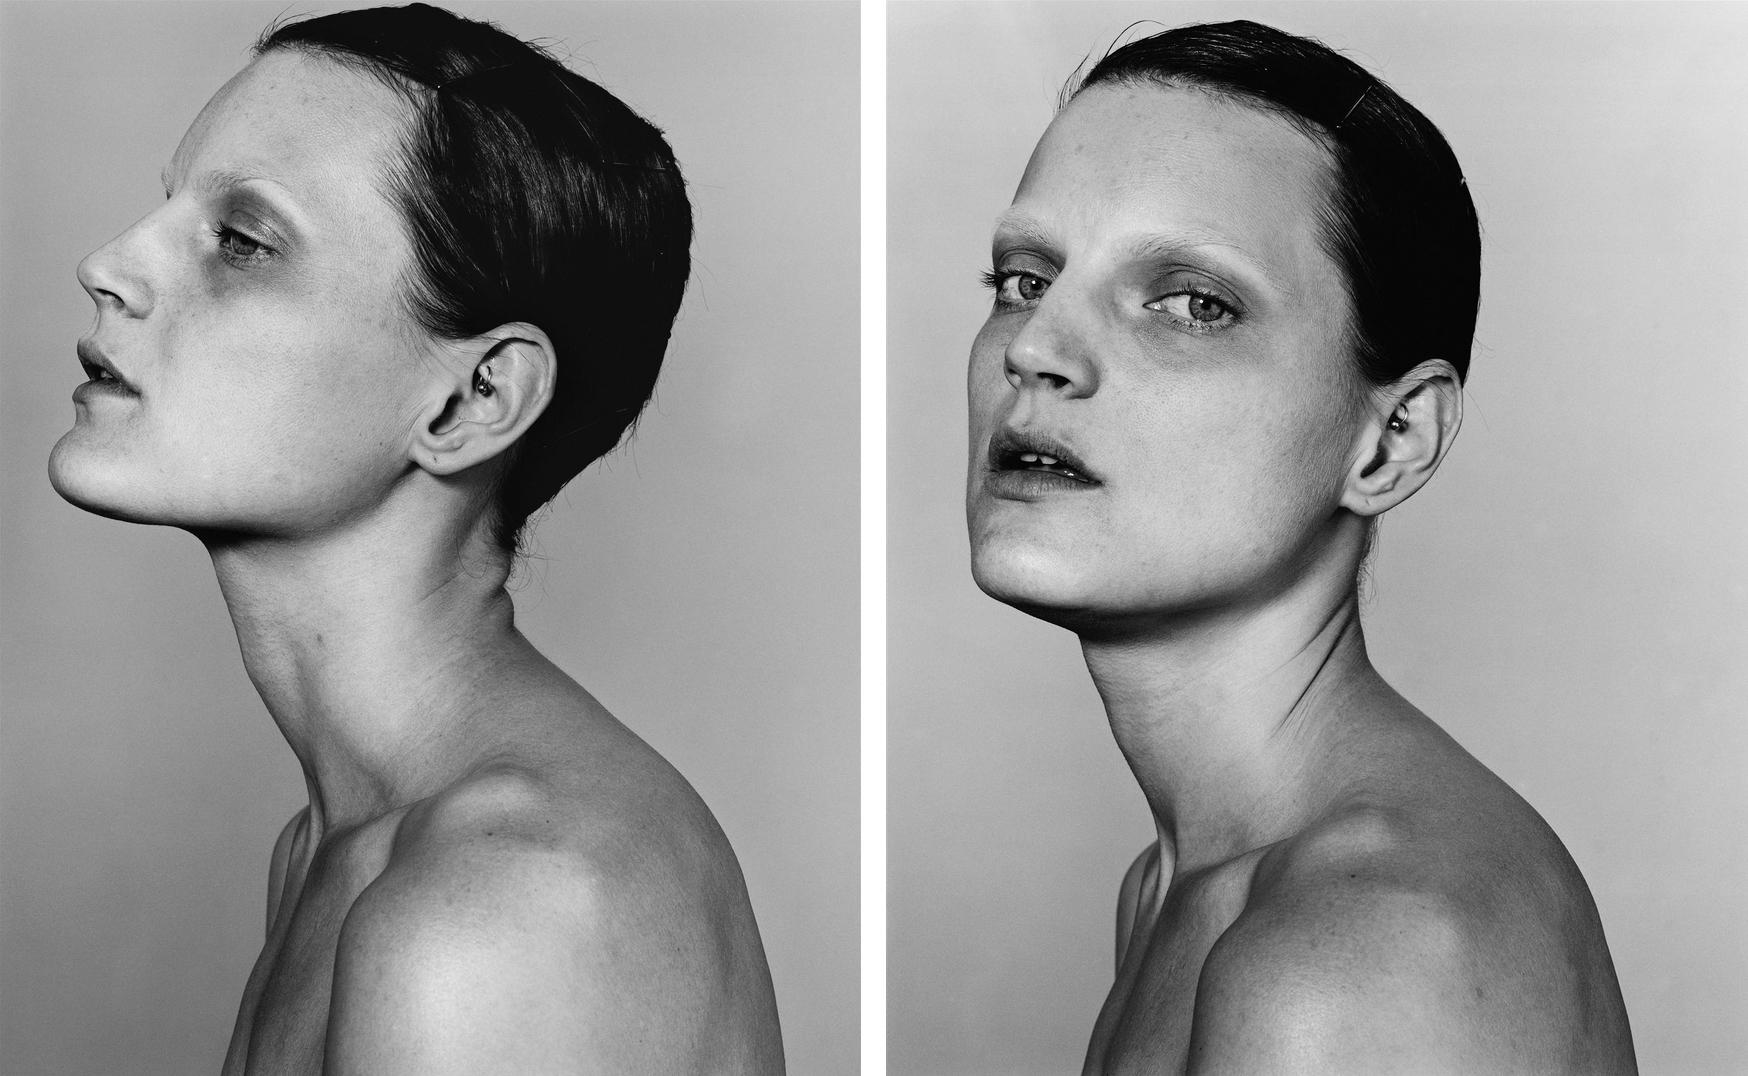 WEIRDO MAG. Magazine, Makeup Artists FRANCELLE